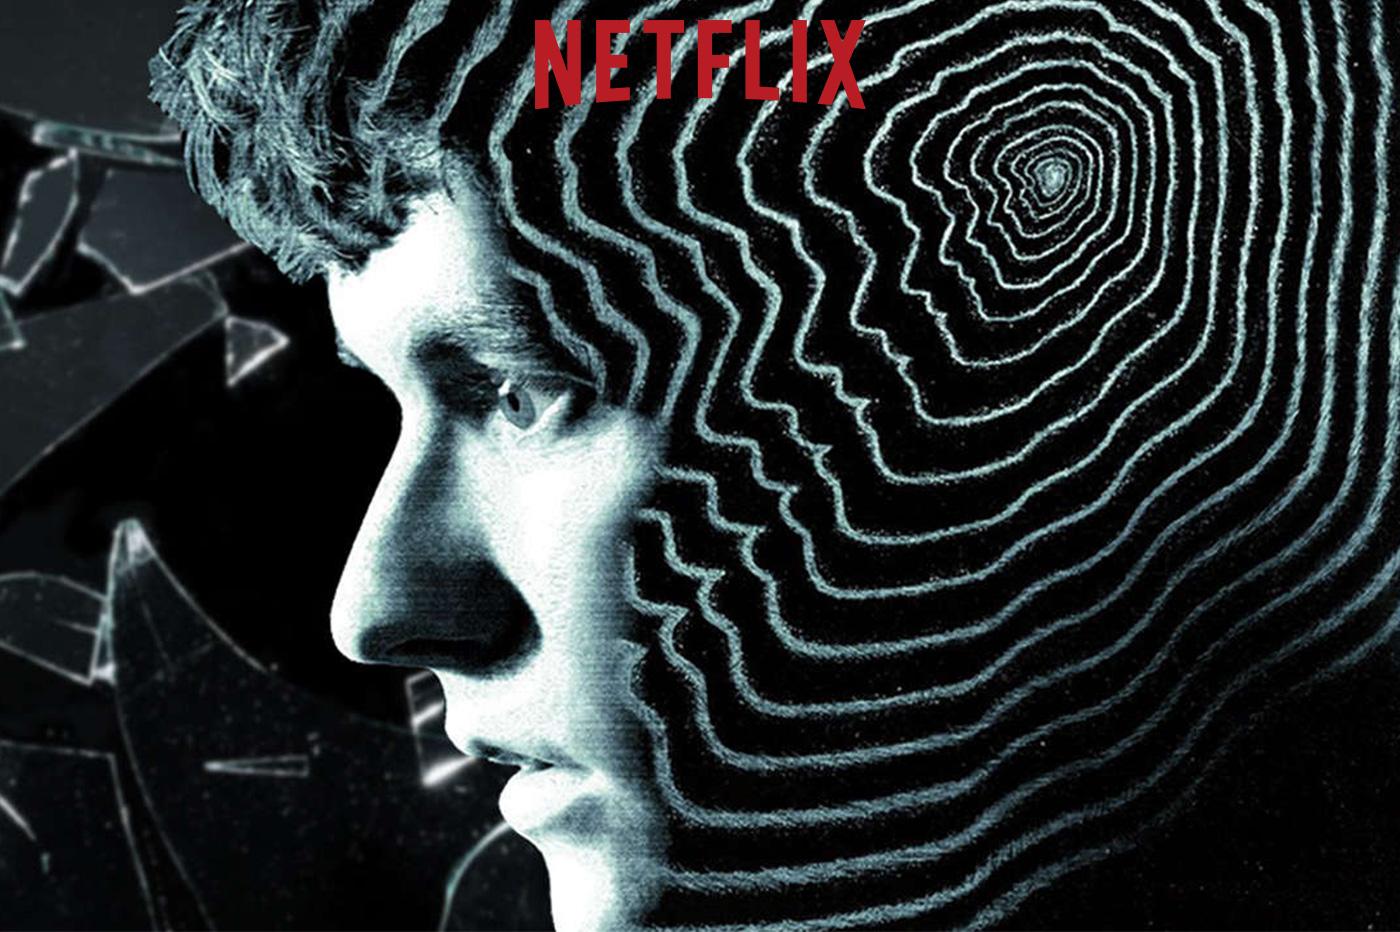 Netflix proposera d'autres contenus interactifs comme Black Mirror Bandersnatch